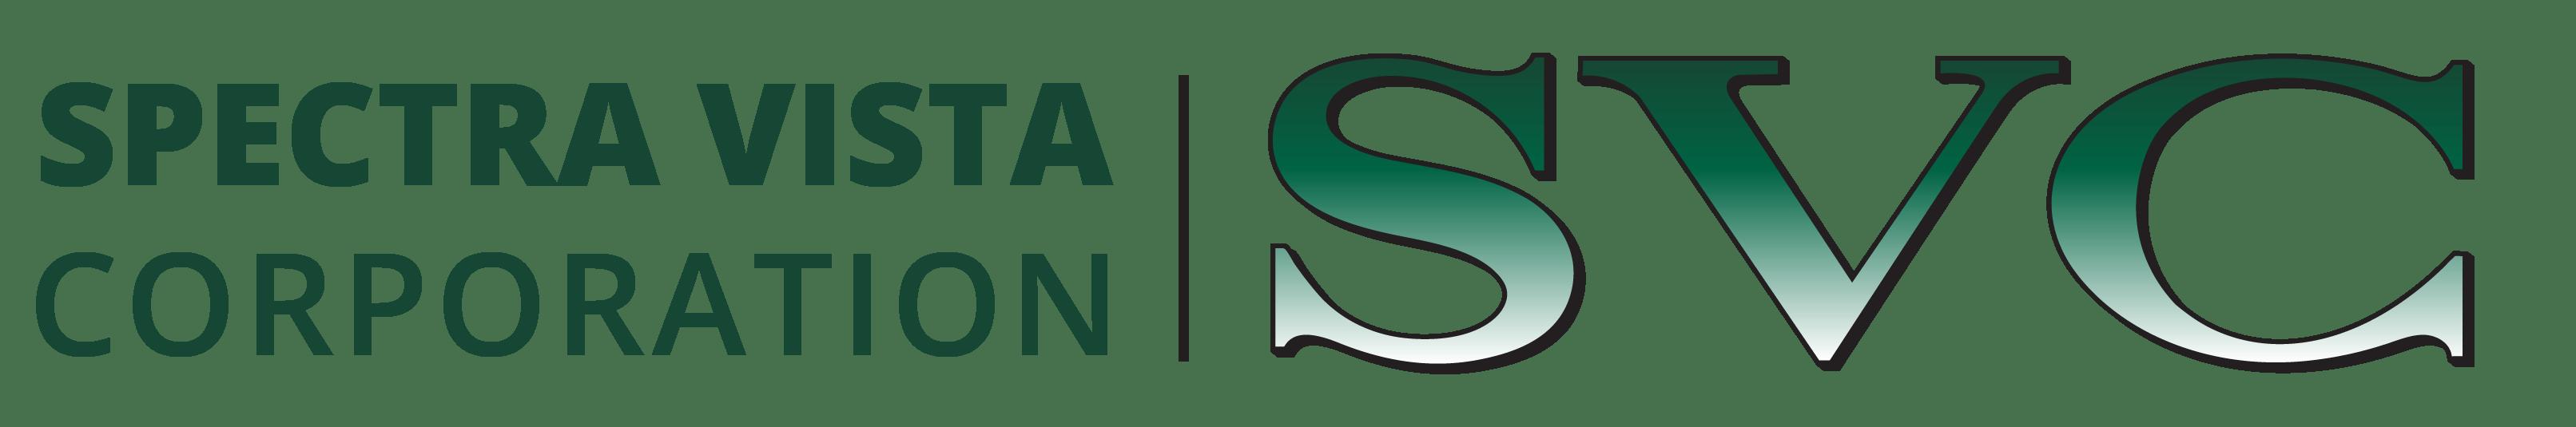 SVC: Spectra Vista Corporation